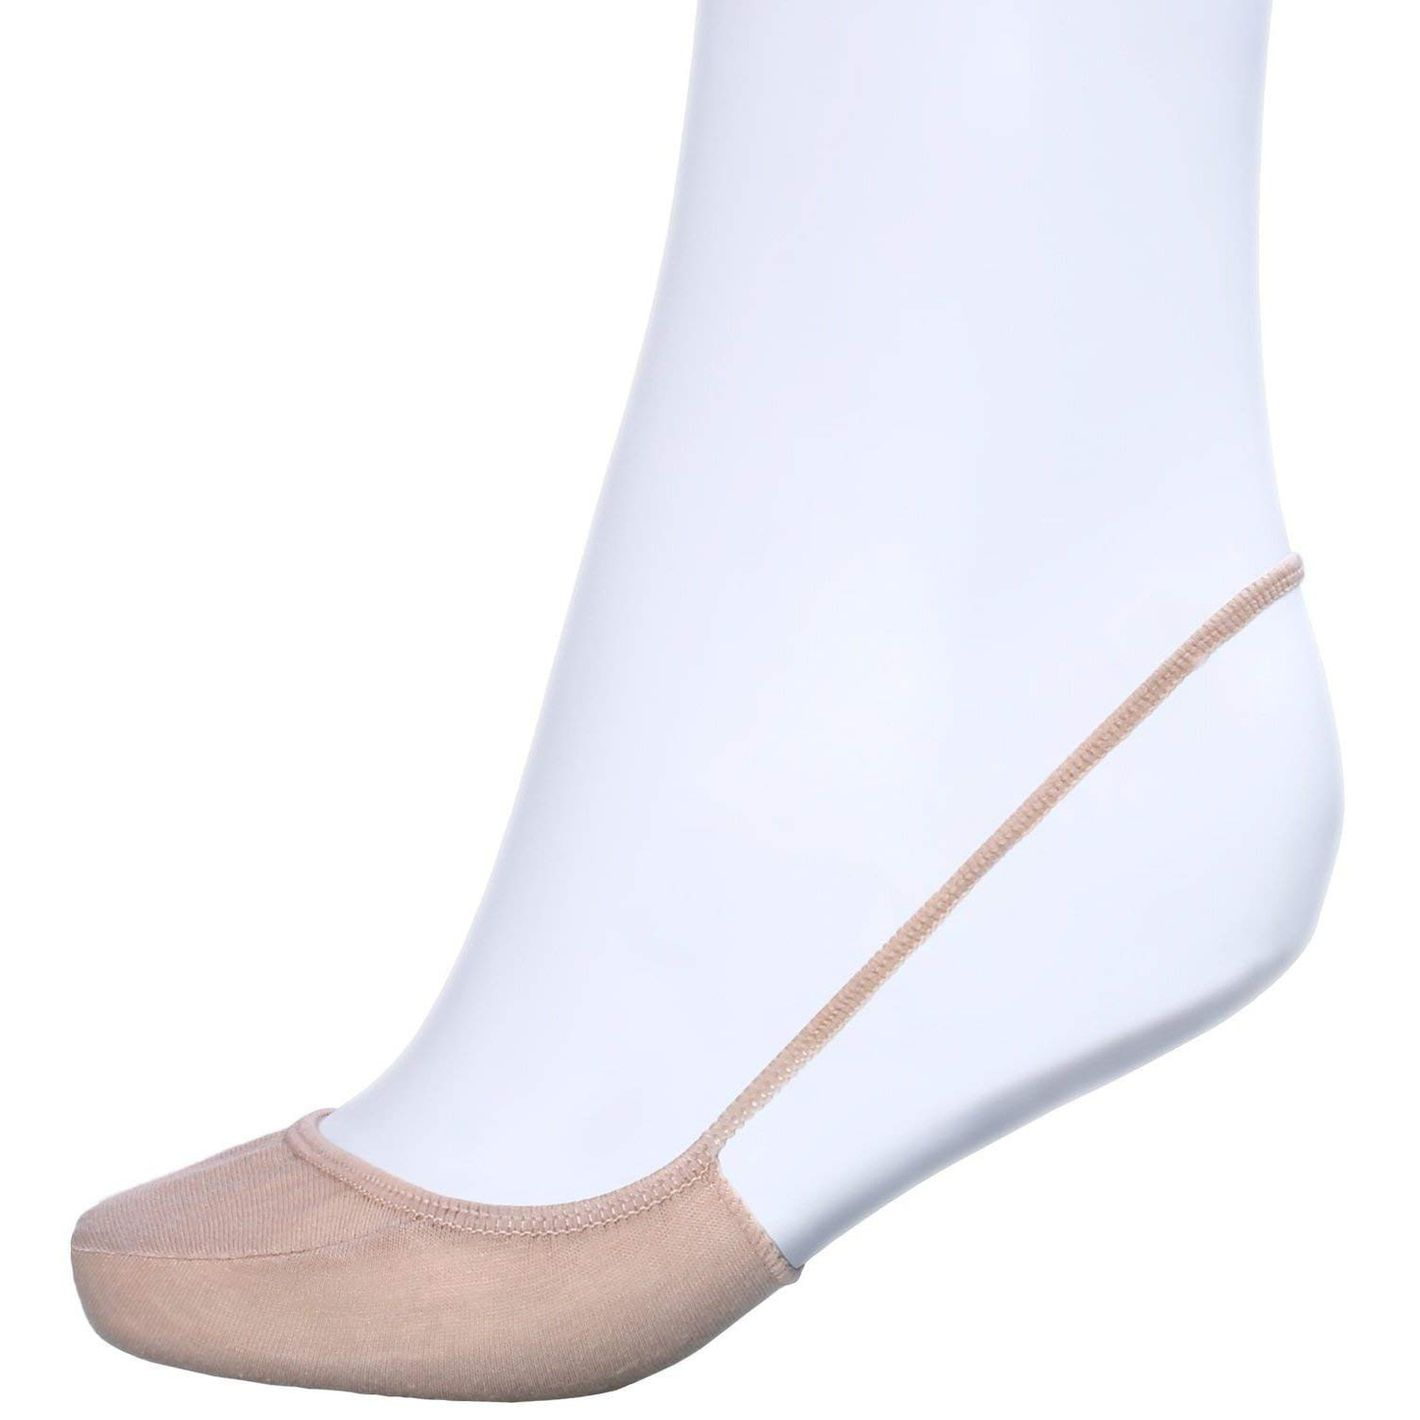 Sanvan Women's Low-Cut No-Show Half Socks With Sling Back